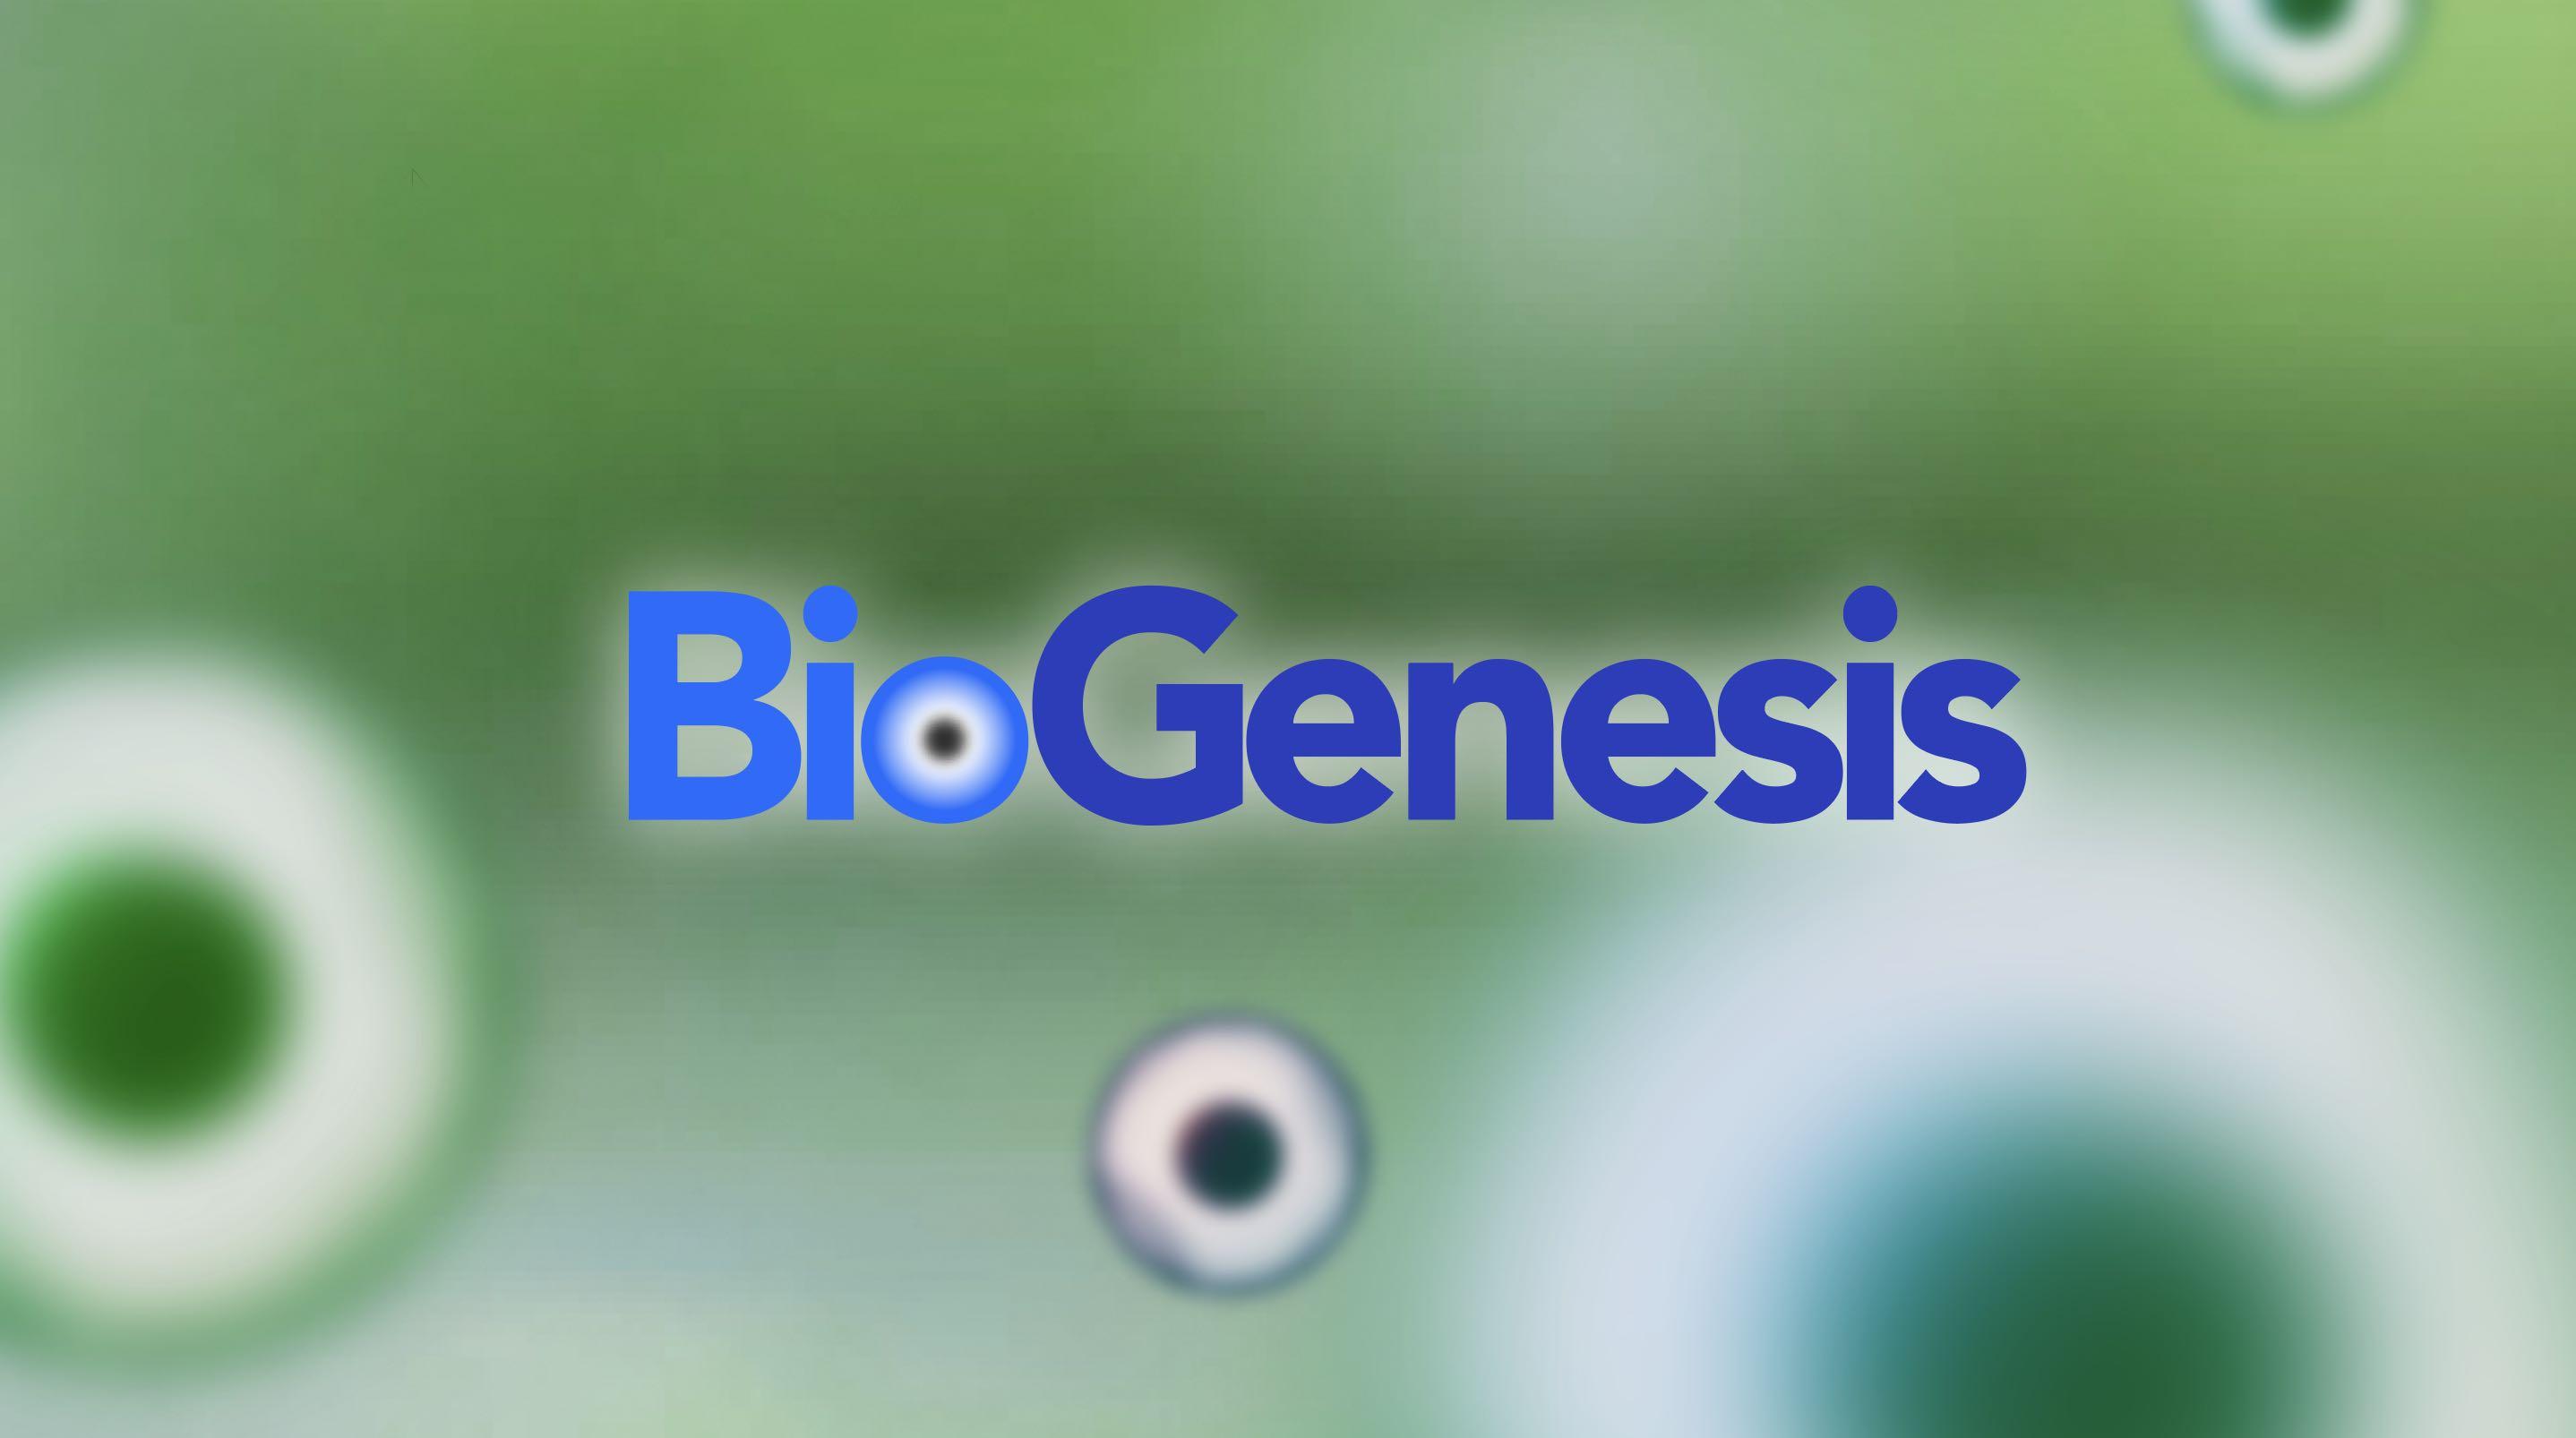 BioGenesis: Episode 3